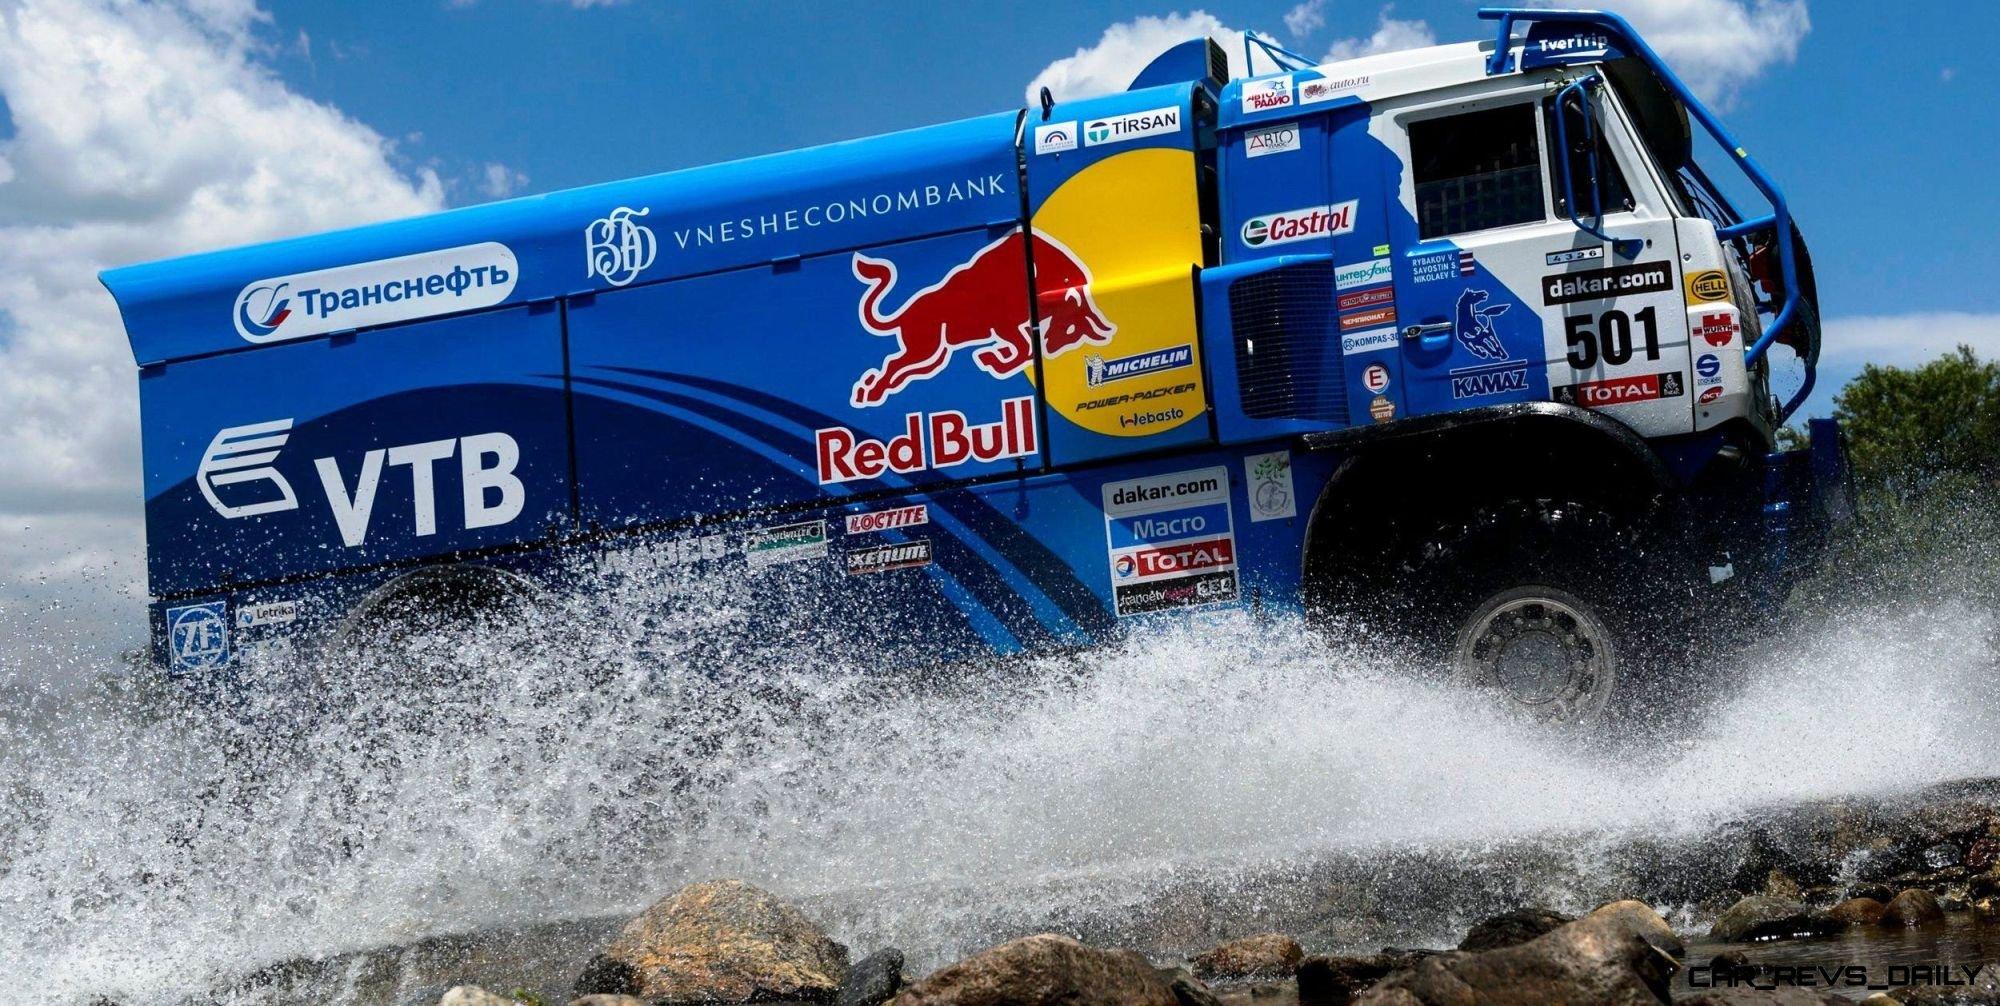 Unimog Nemesis - Red Bull KAMAZ 4911 - Dakar T4 Hero  45